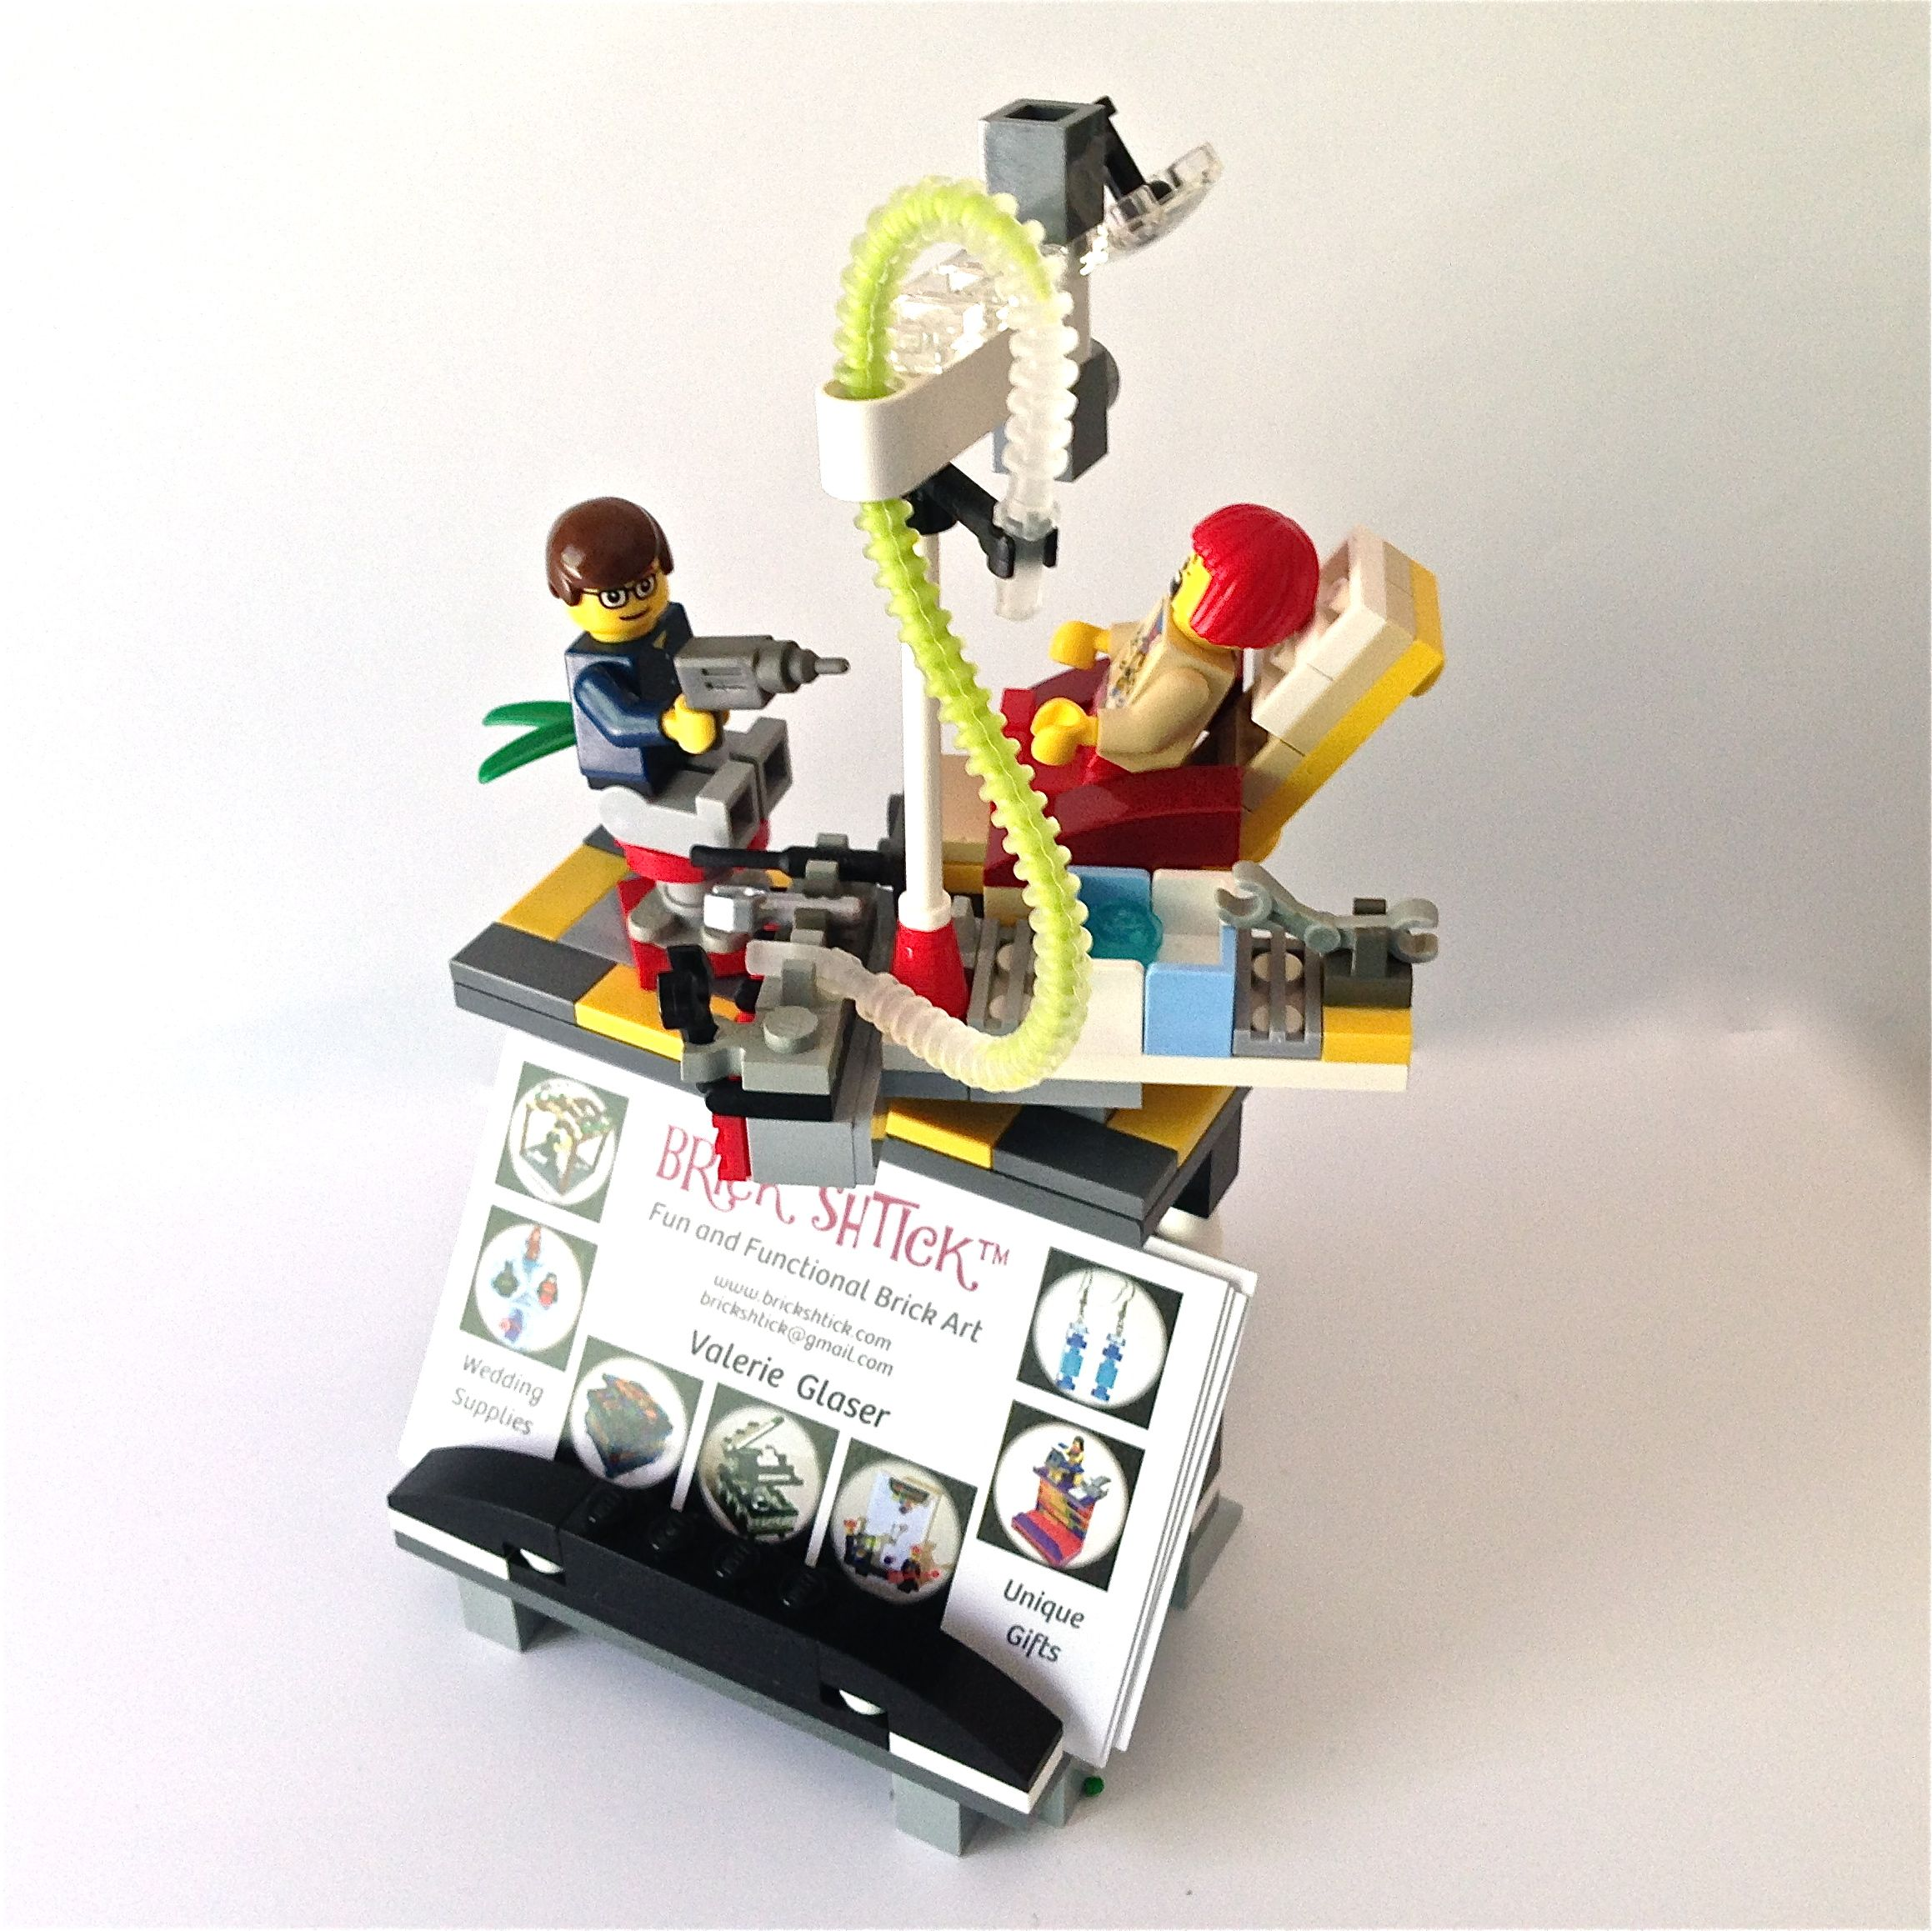 Lego Visitenkarte Auch Lego Visitenkarte Abbildung Zusammen